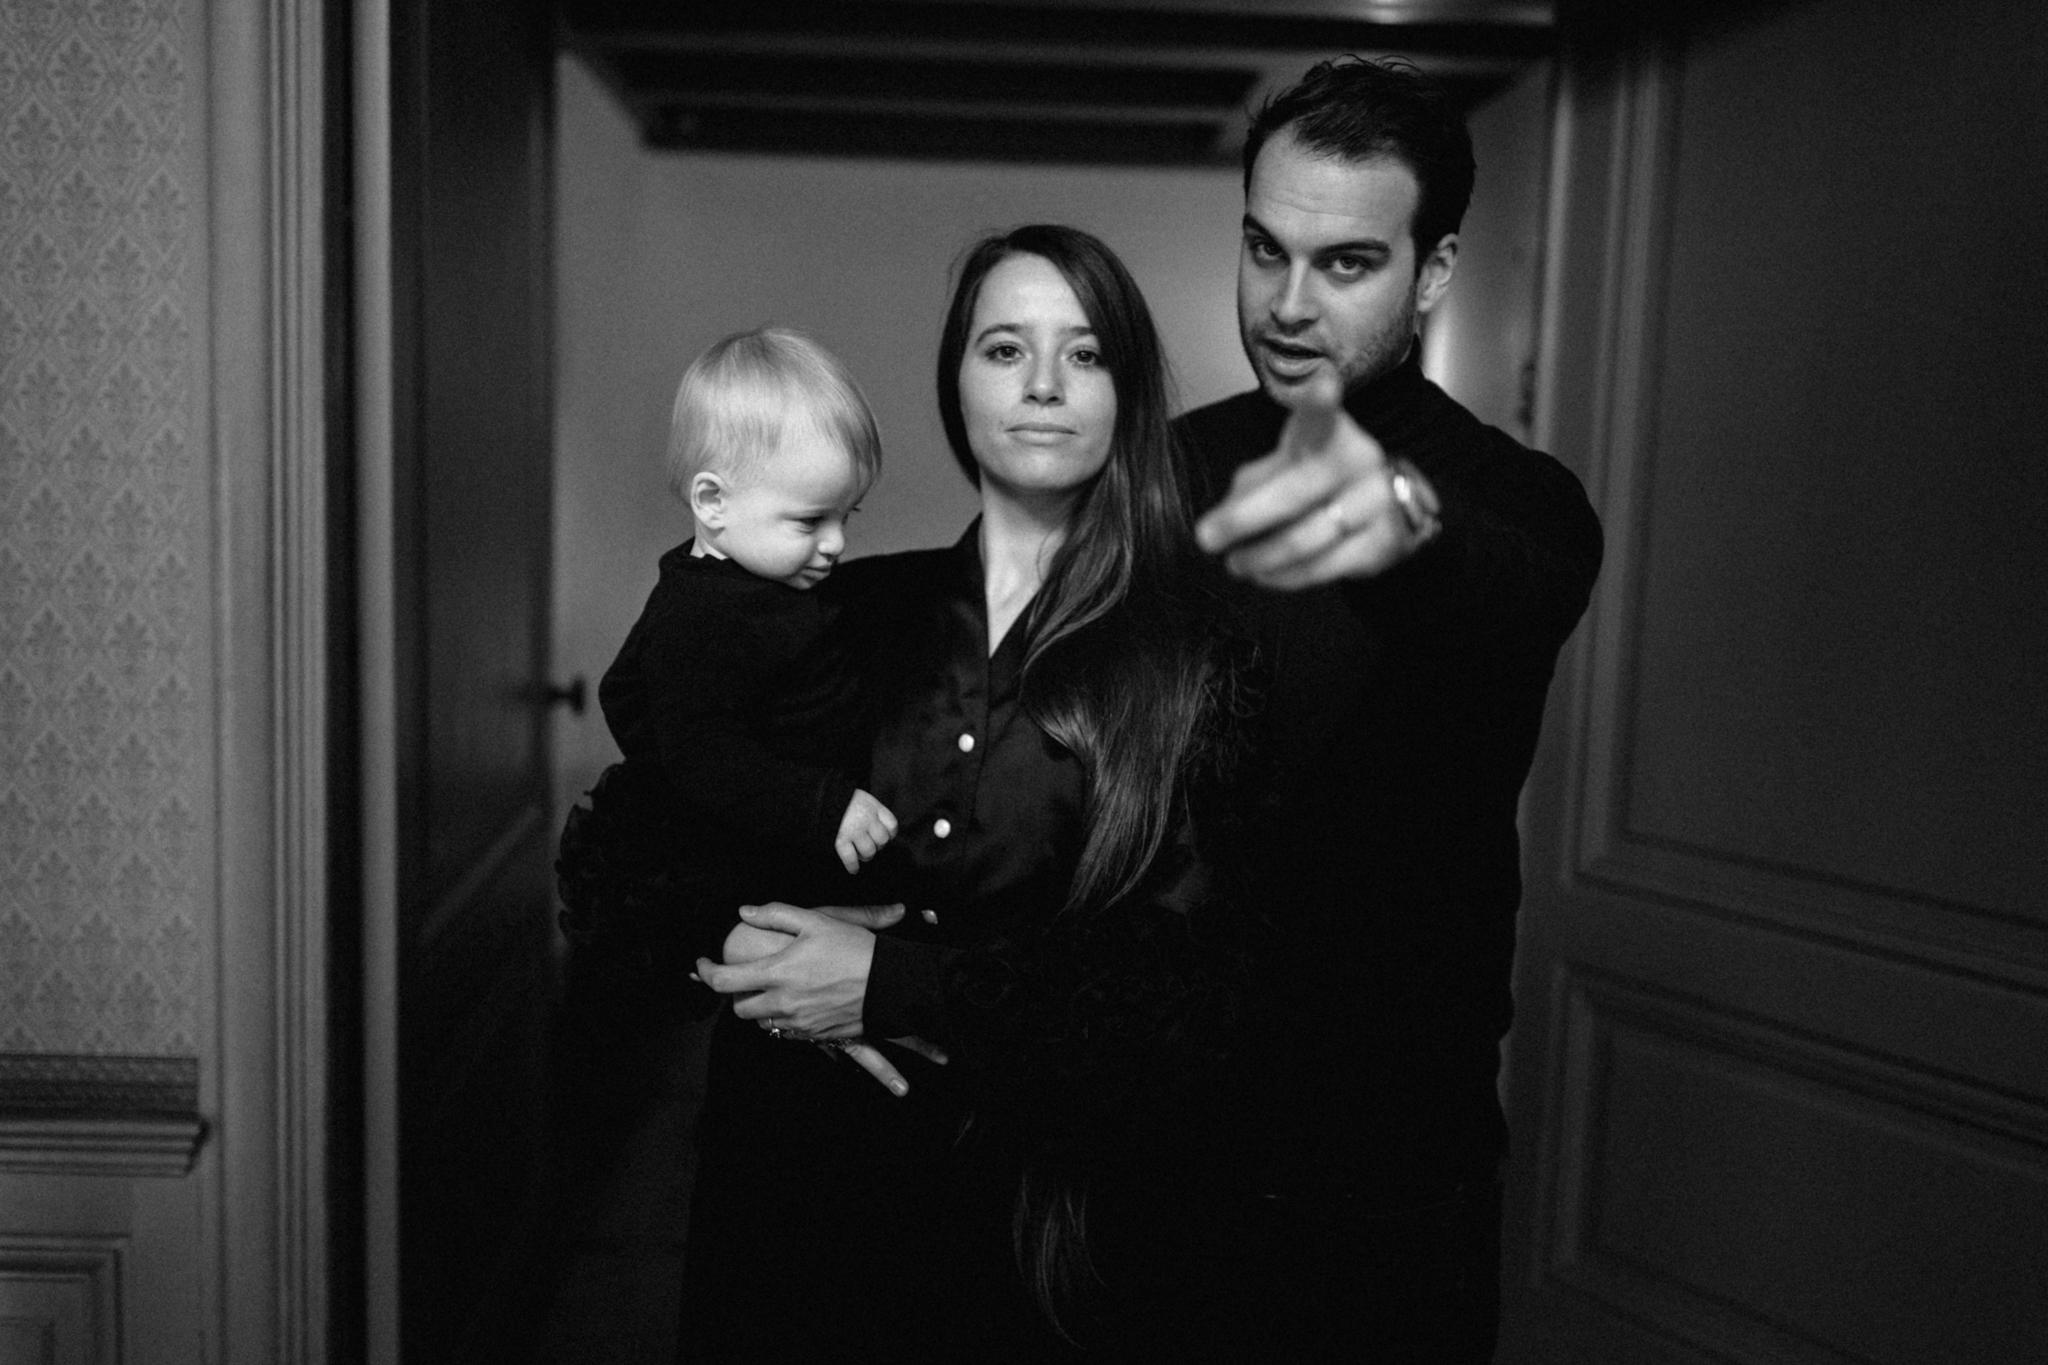 018-sjoerdbooijphotography-family-daan-lotte-bond.jpg